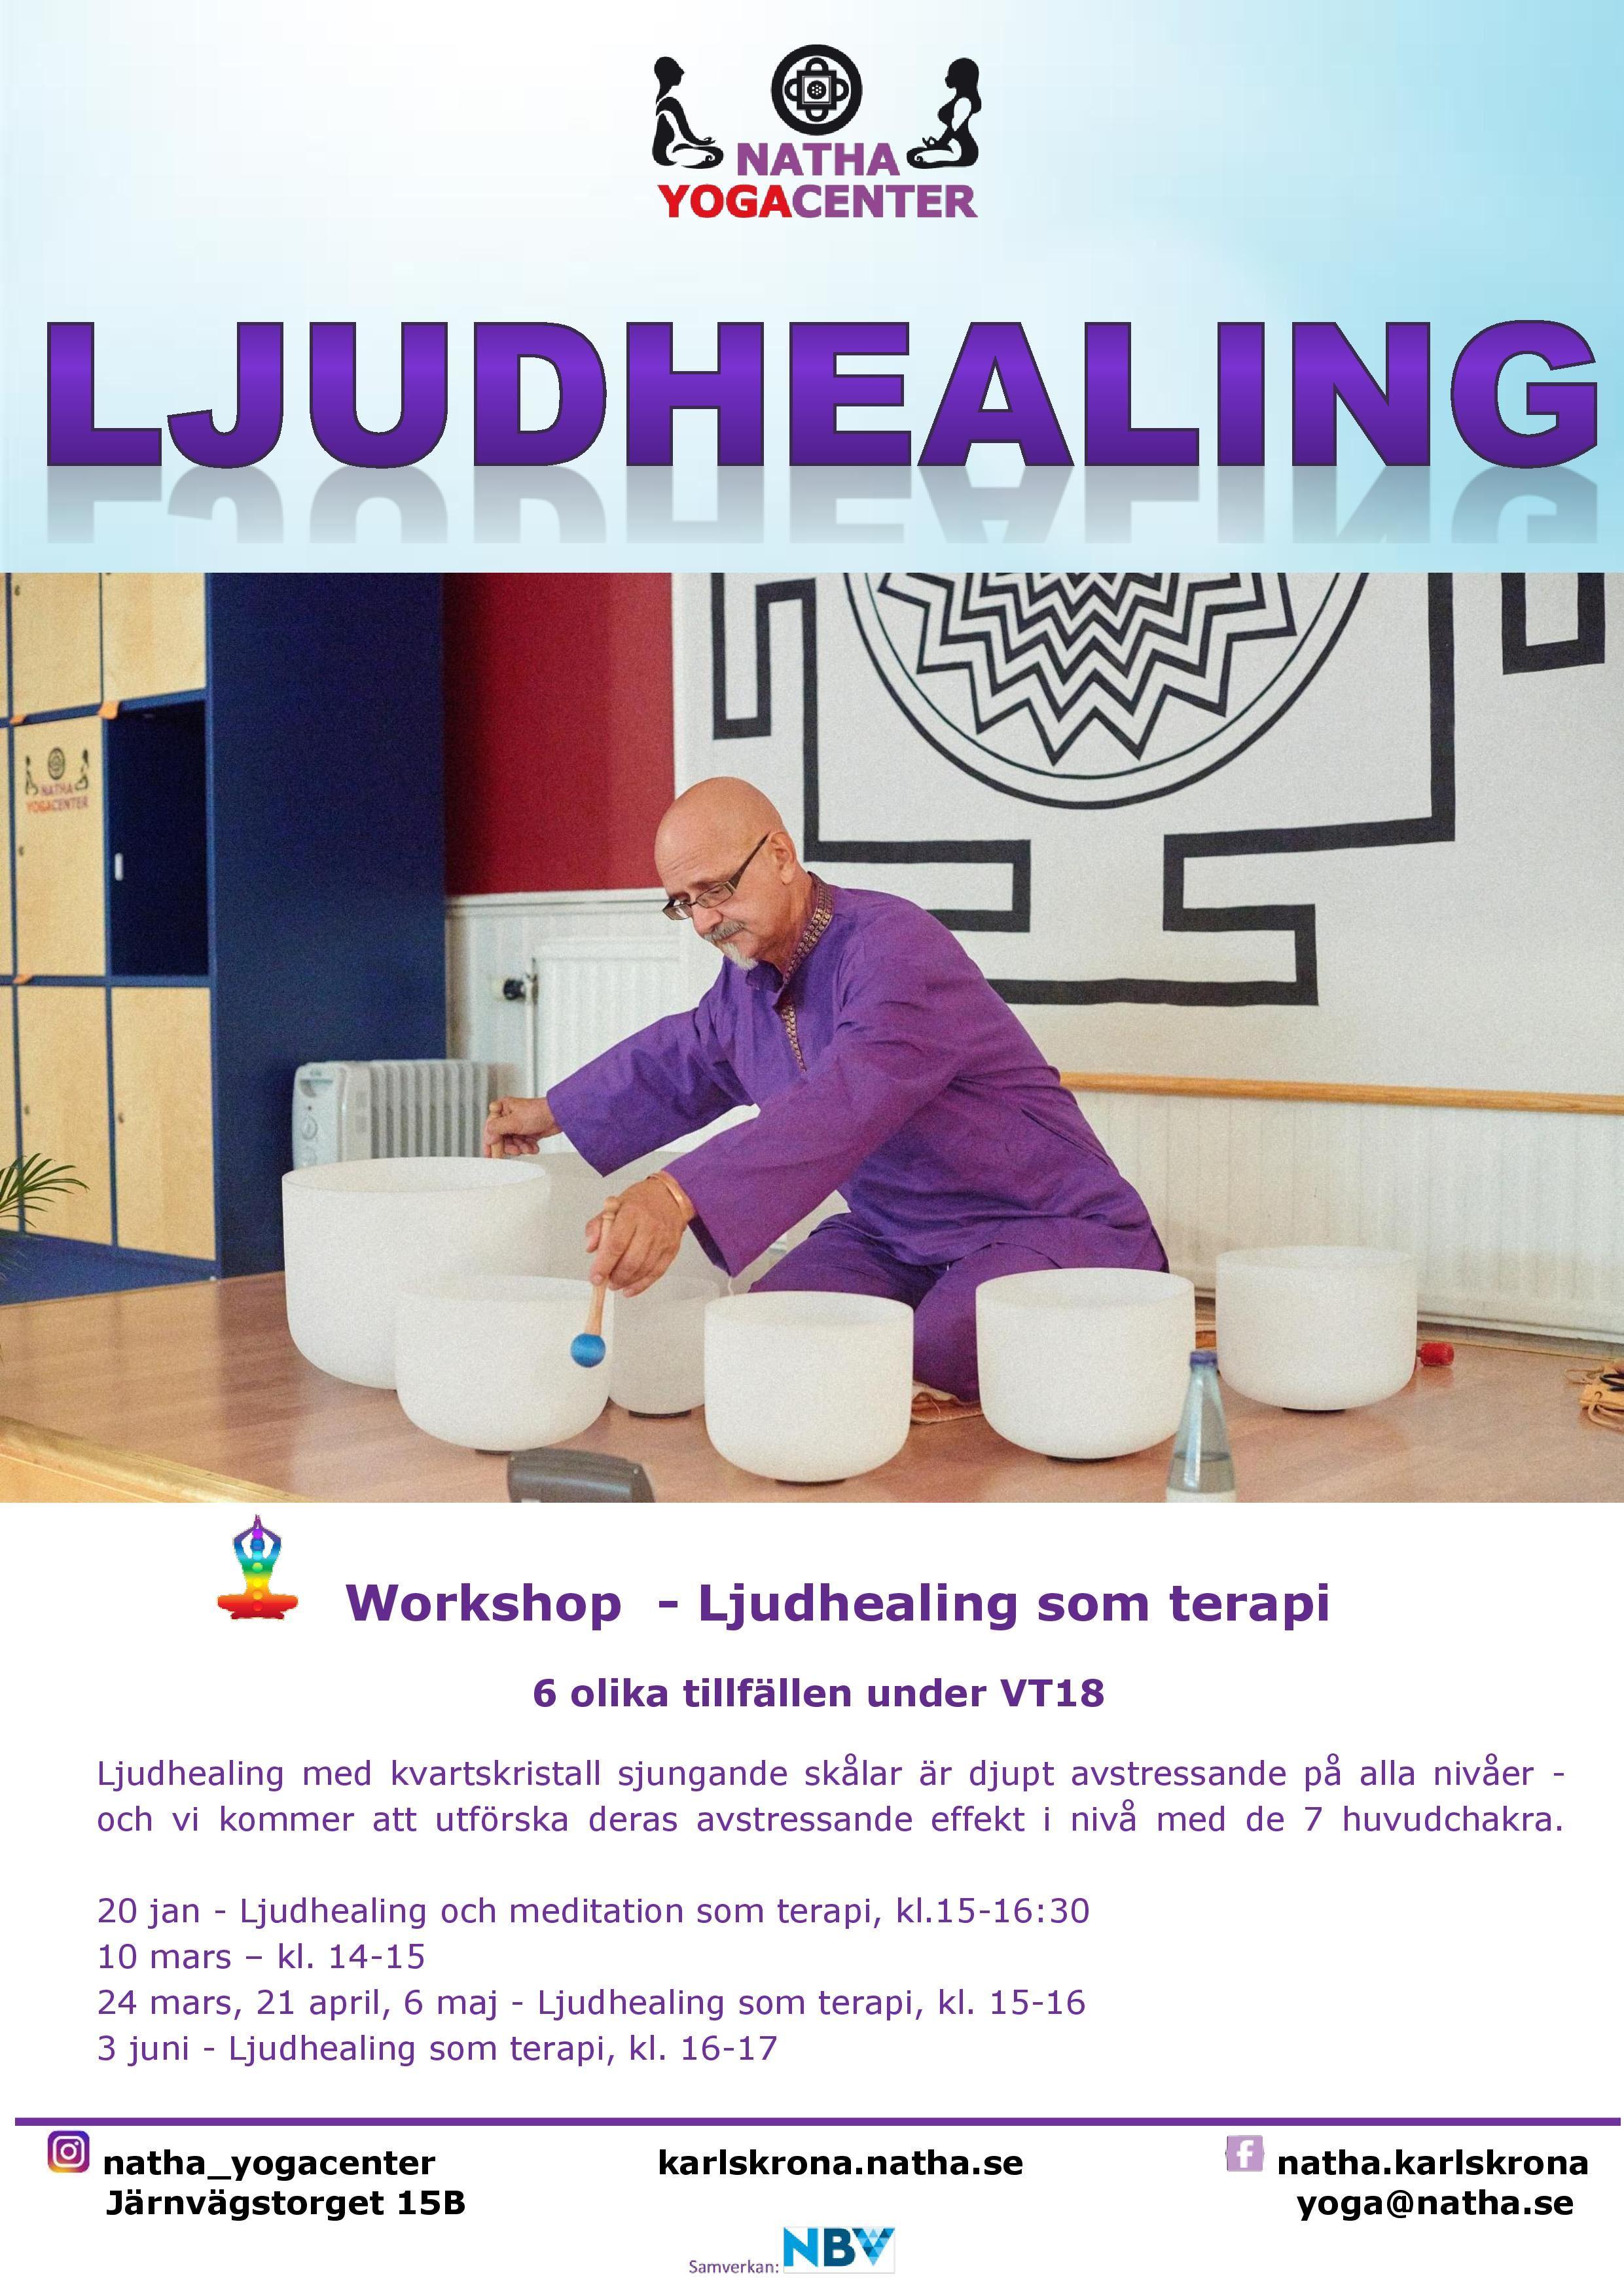 Ljudhealing